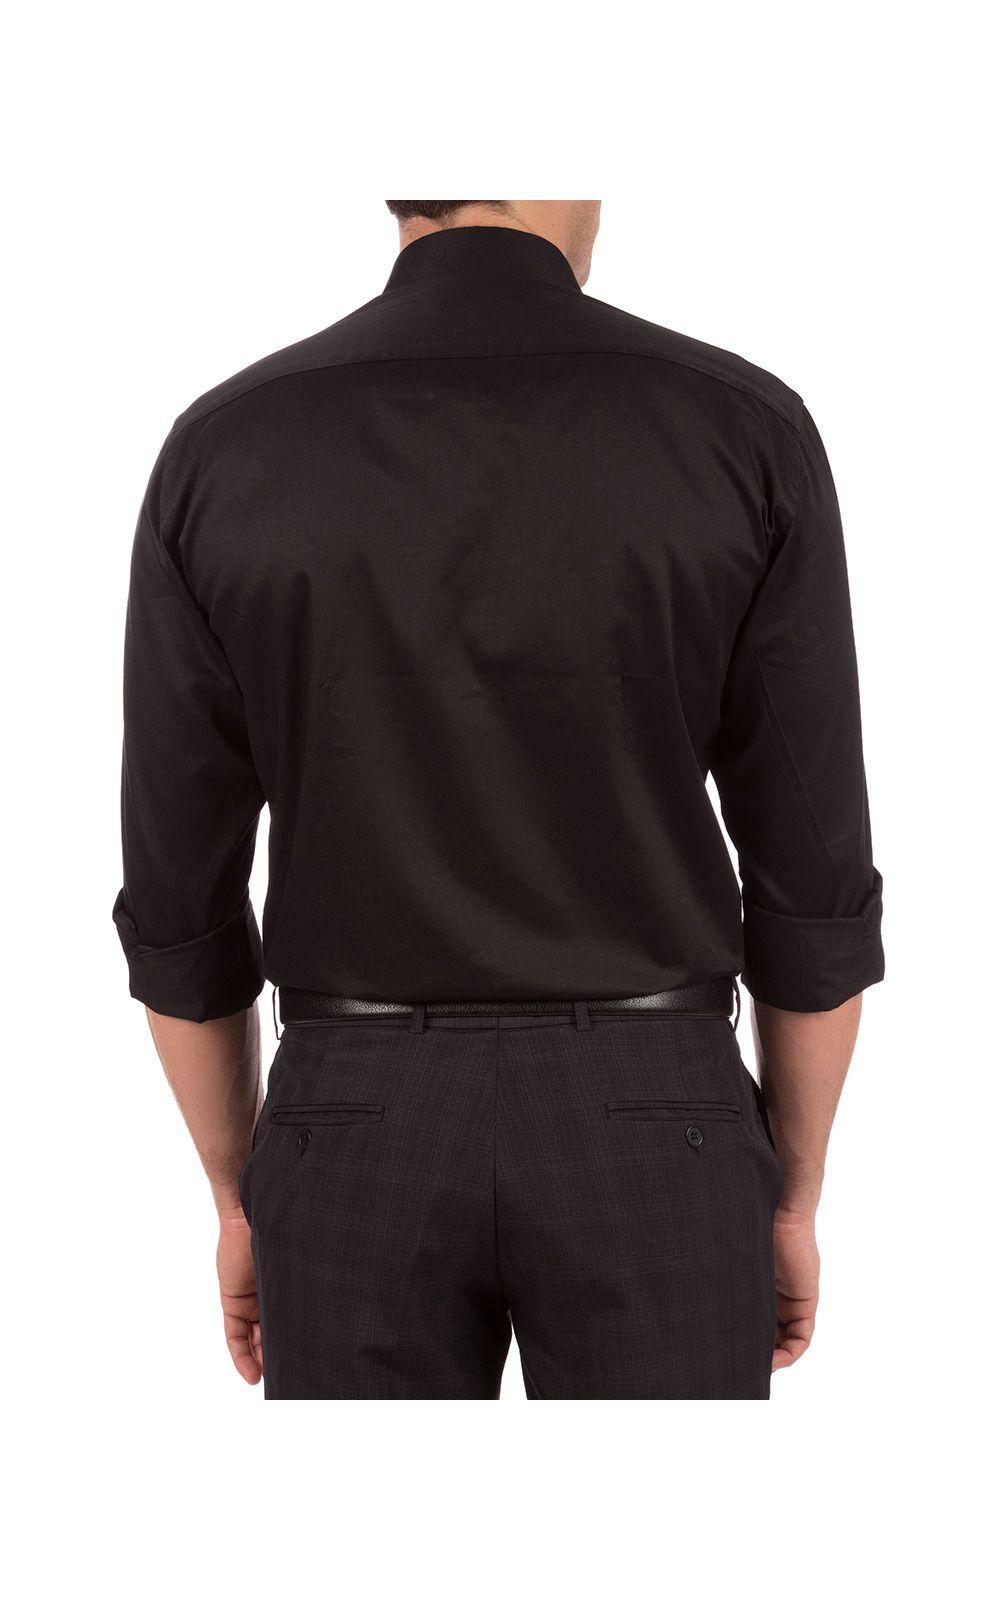 Foto 2 - Camisa Social Masculina Preta Lisa